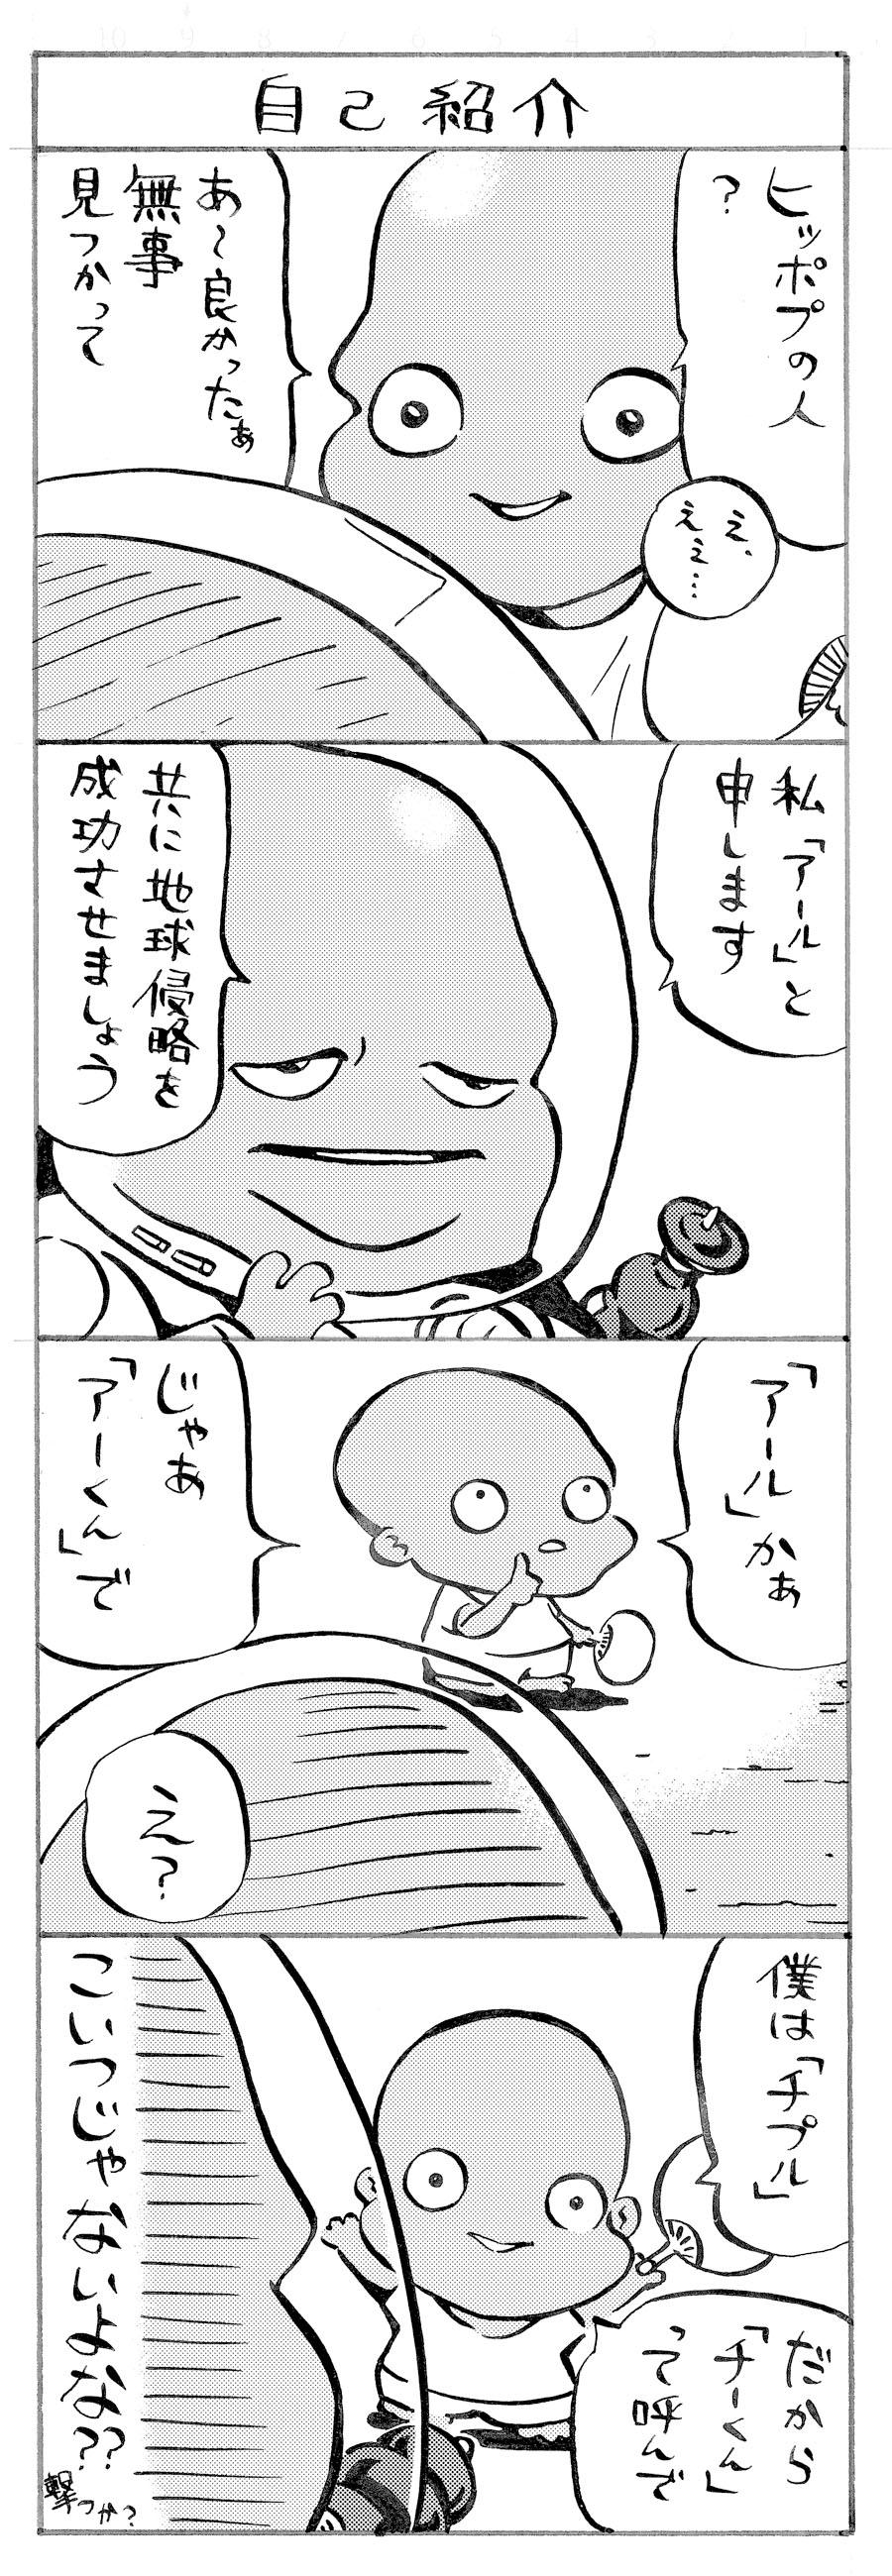 hippseijin_manga_02